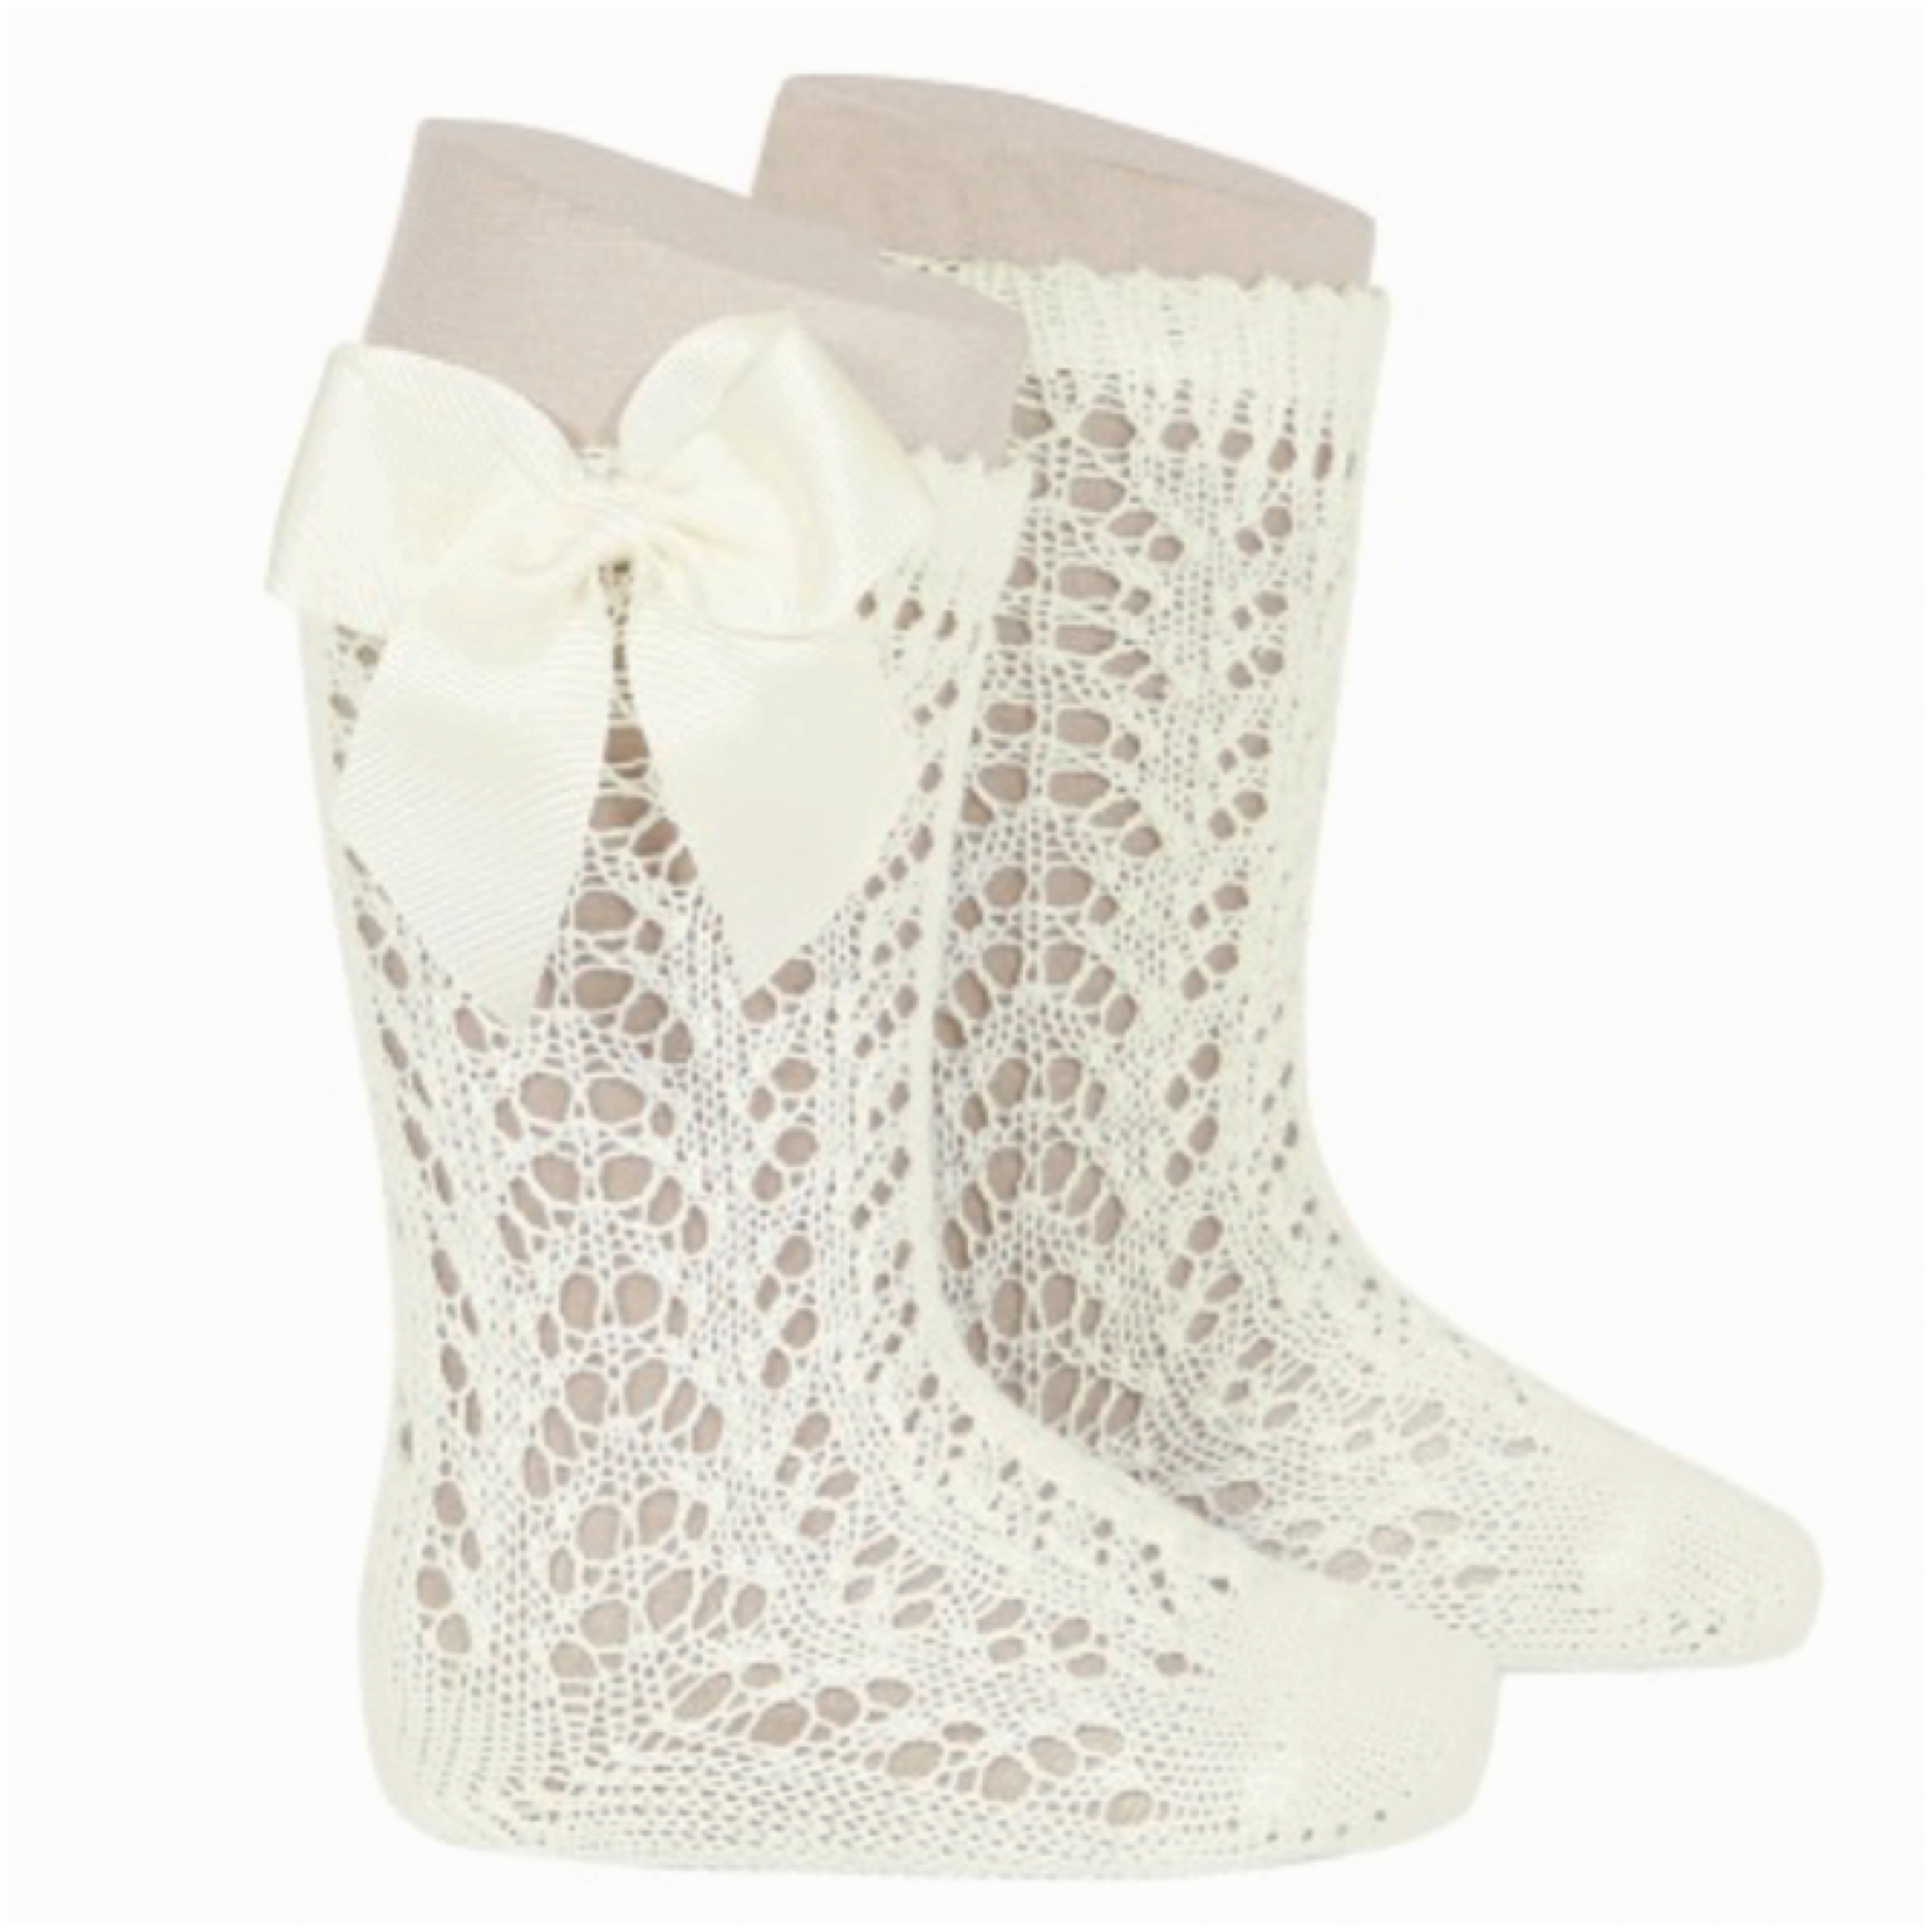 Condor Perle Open Work Knee Socks, Cream